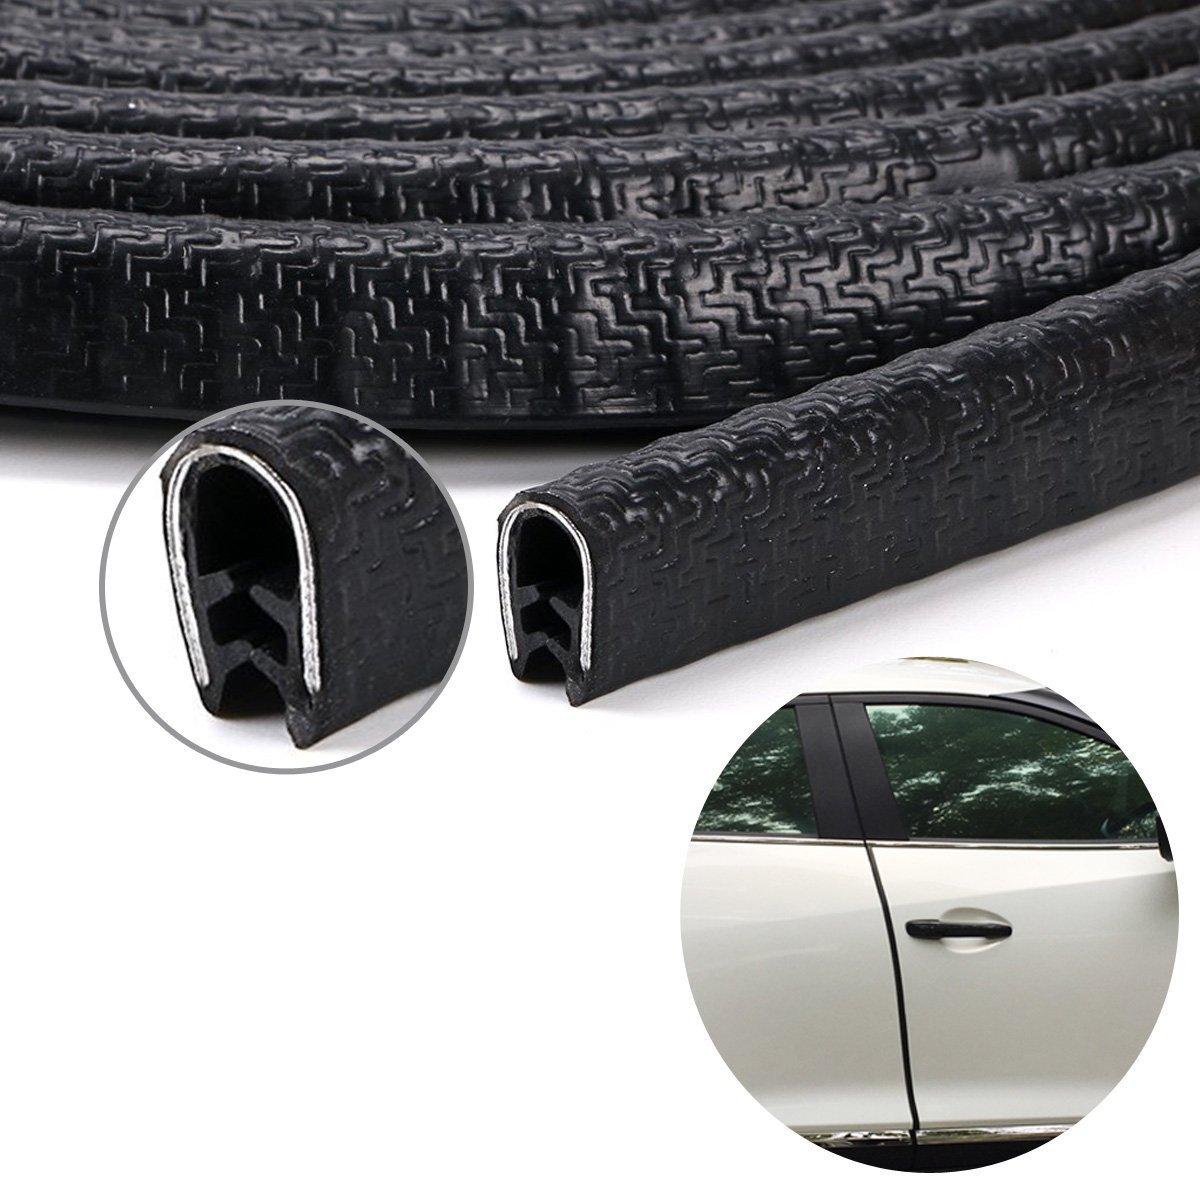 Car Door Edge Guard, U Shape Rubber Edging Protector Strip for Metal, Glass, Boat and Grip Range, Fit 2.5mm thickness edge 2 Packs Total 10 Meters Bro